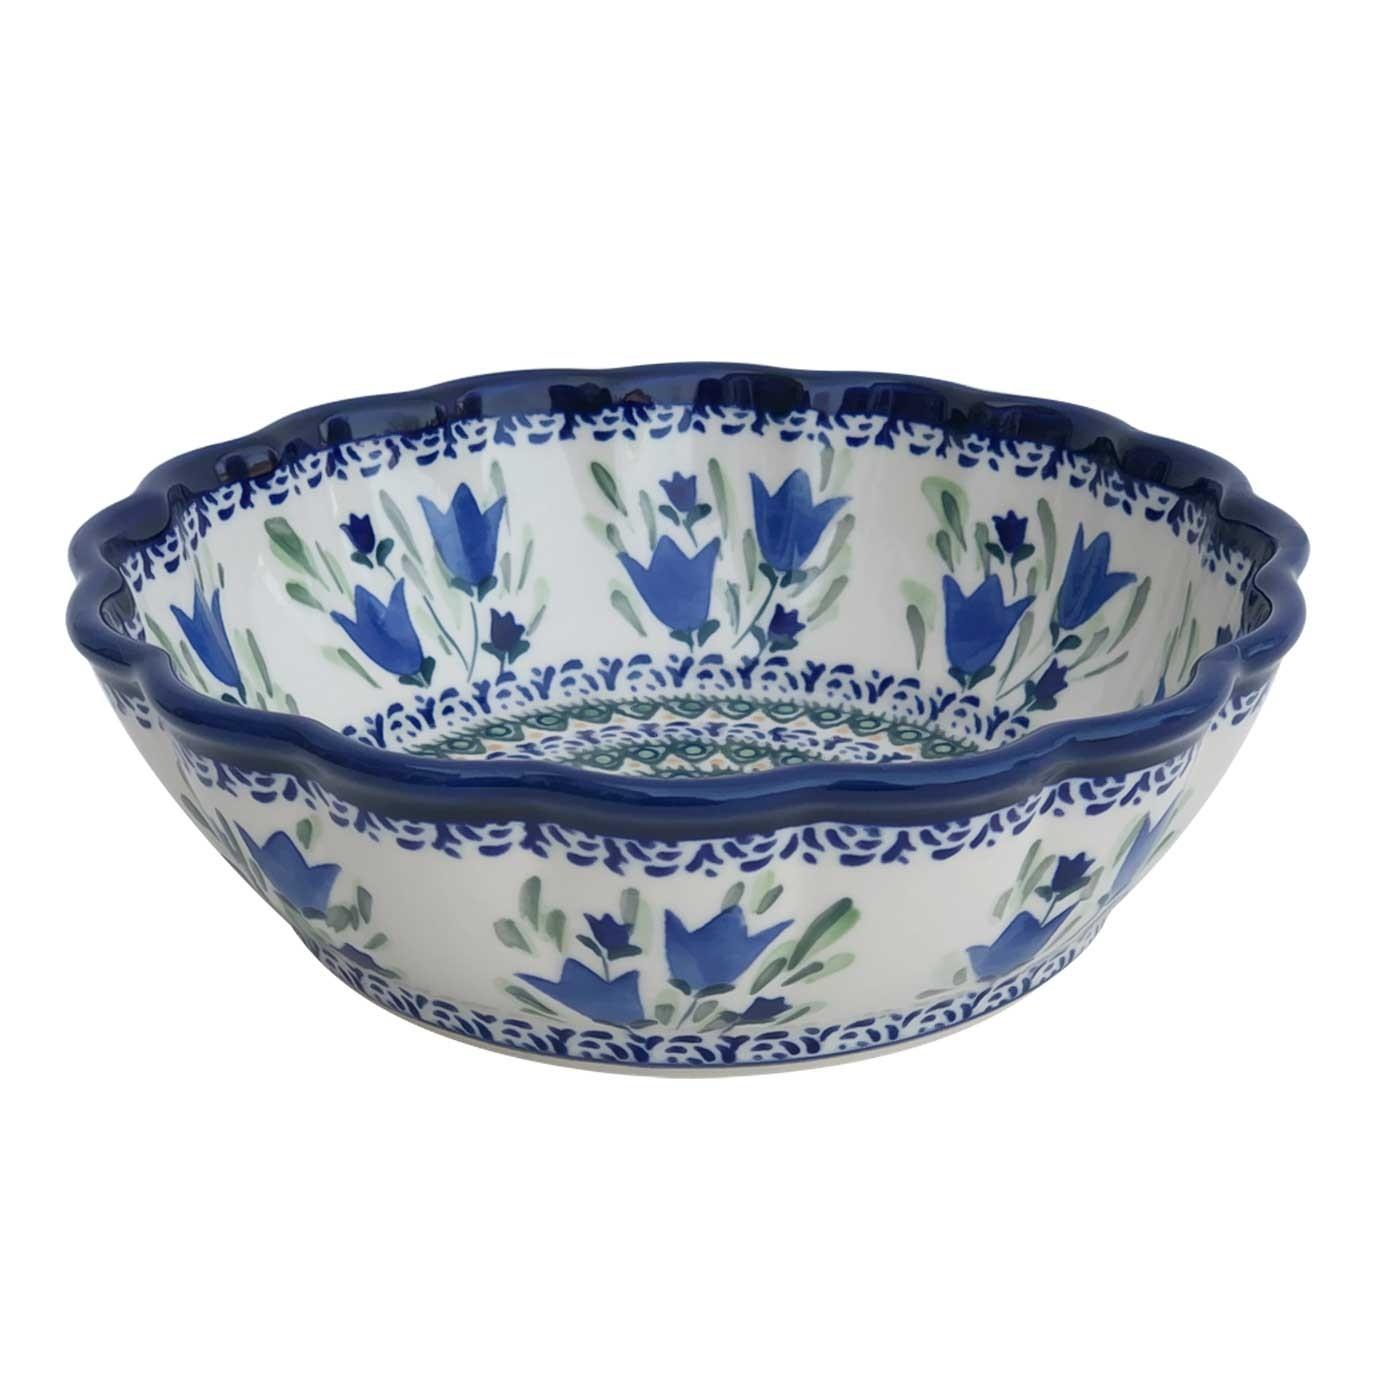 "Pottery Avenue Blue Tulips 8.5"" Scalloped Stoneware Bowl"